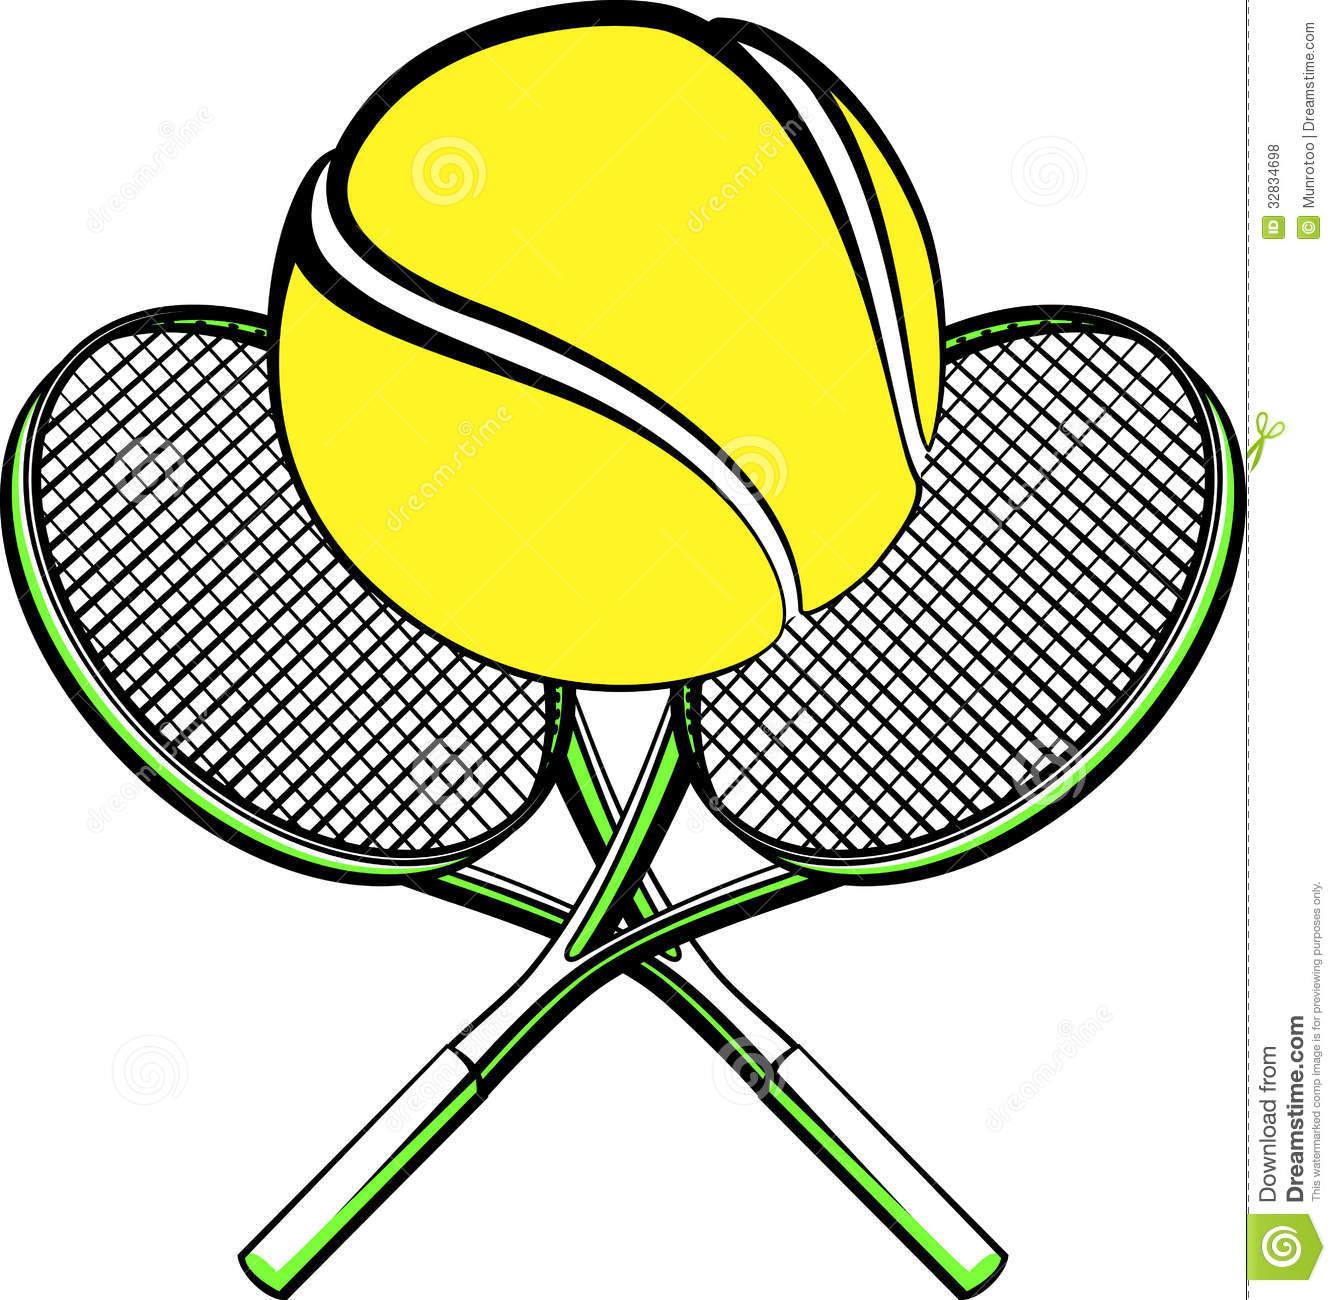 Ball Sitting Next to Tennis Racket Clip Art